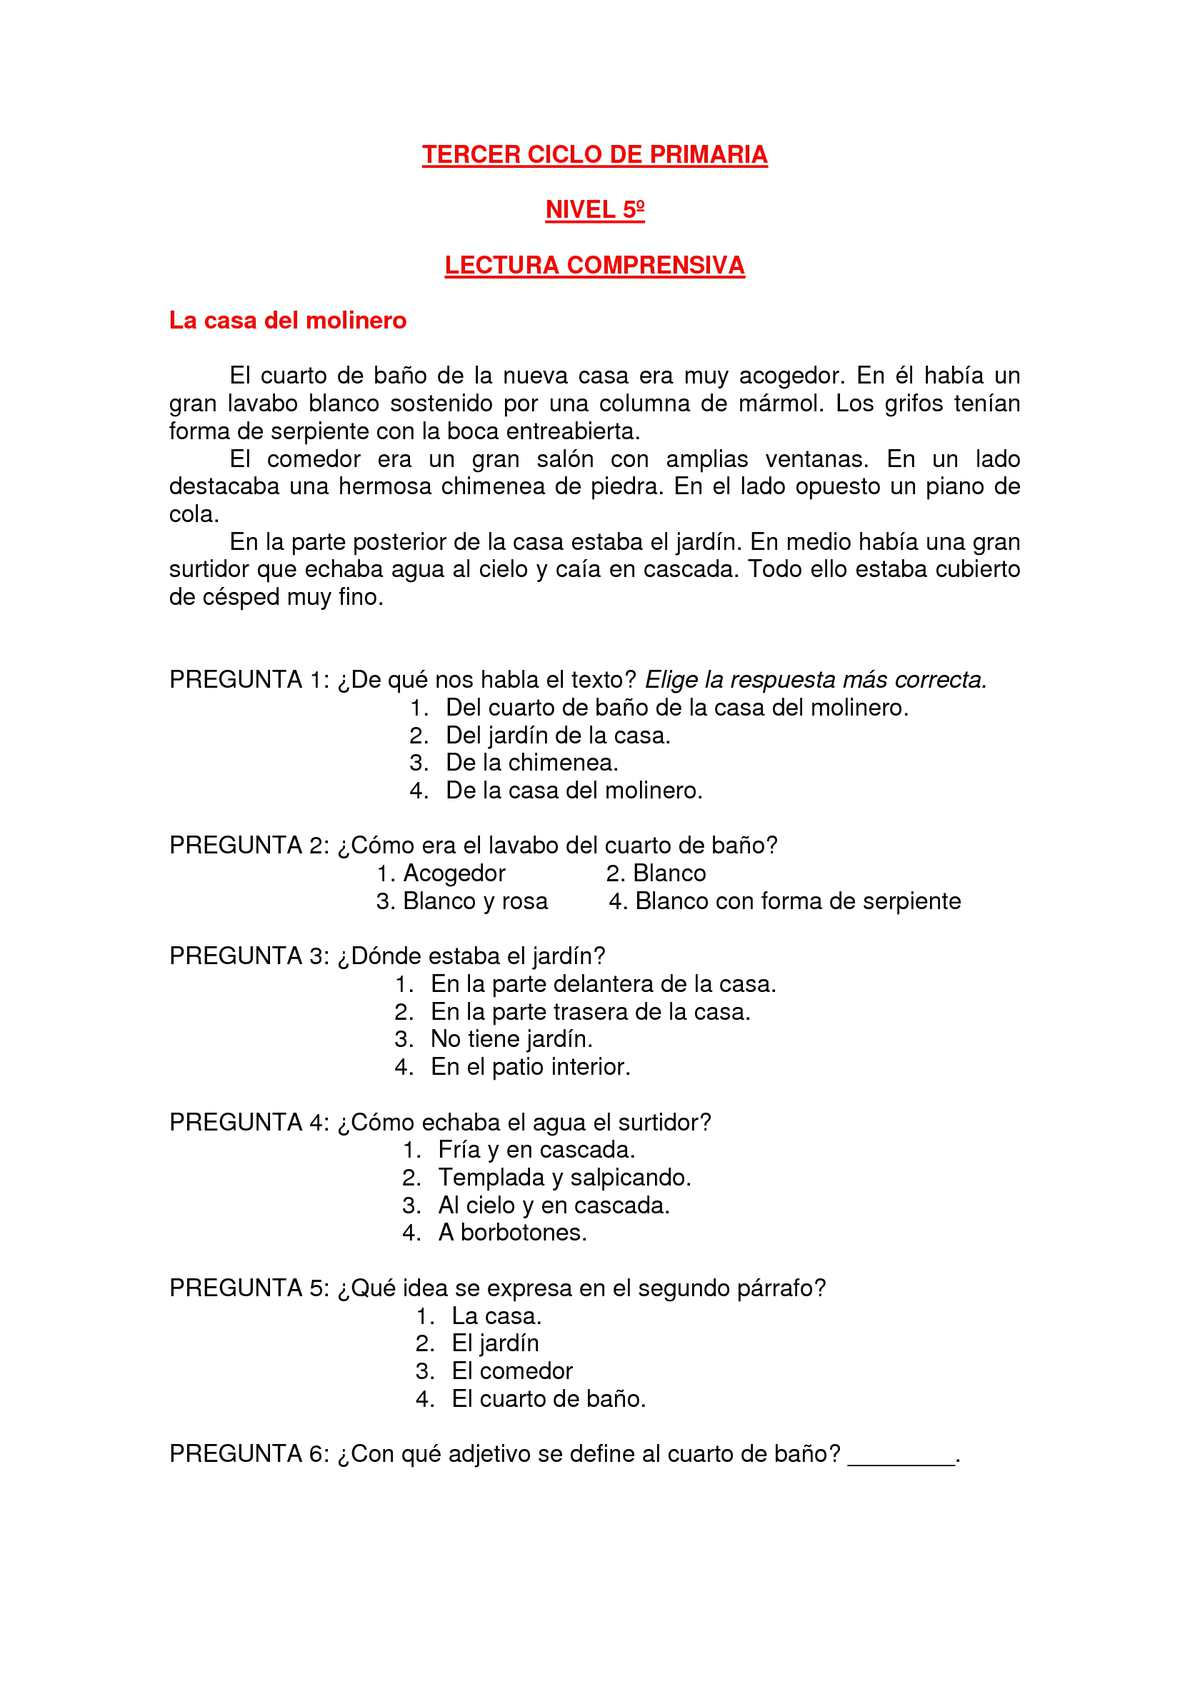 Calamo  LECTURAS COMPRENSIVAS TERCER CICLO PRIMARIA